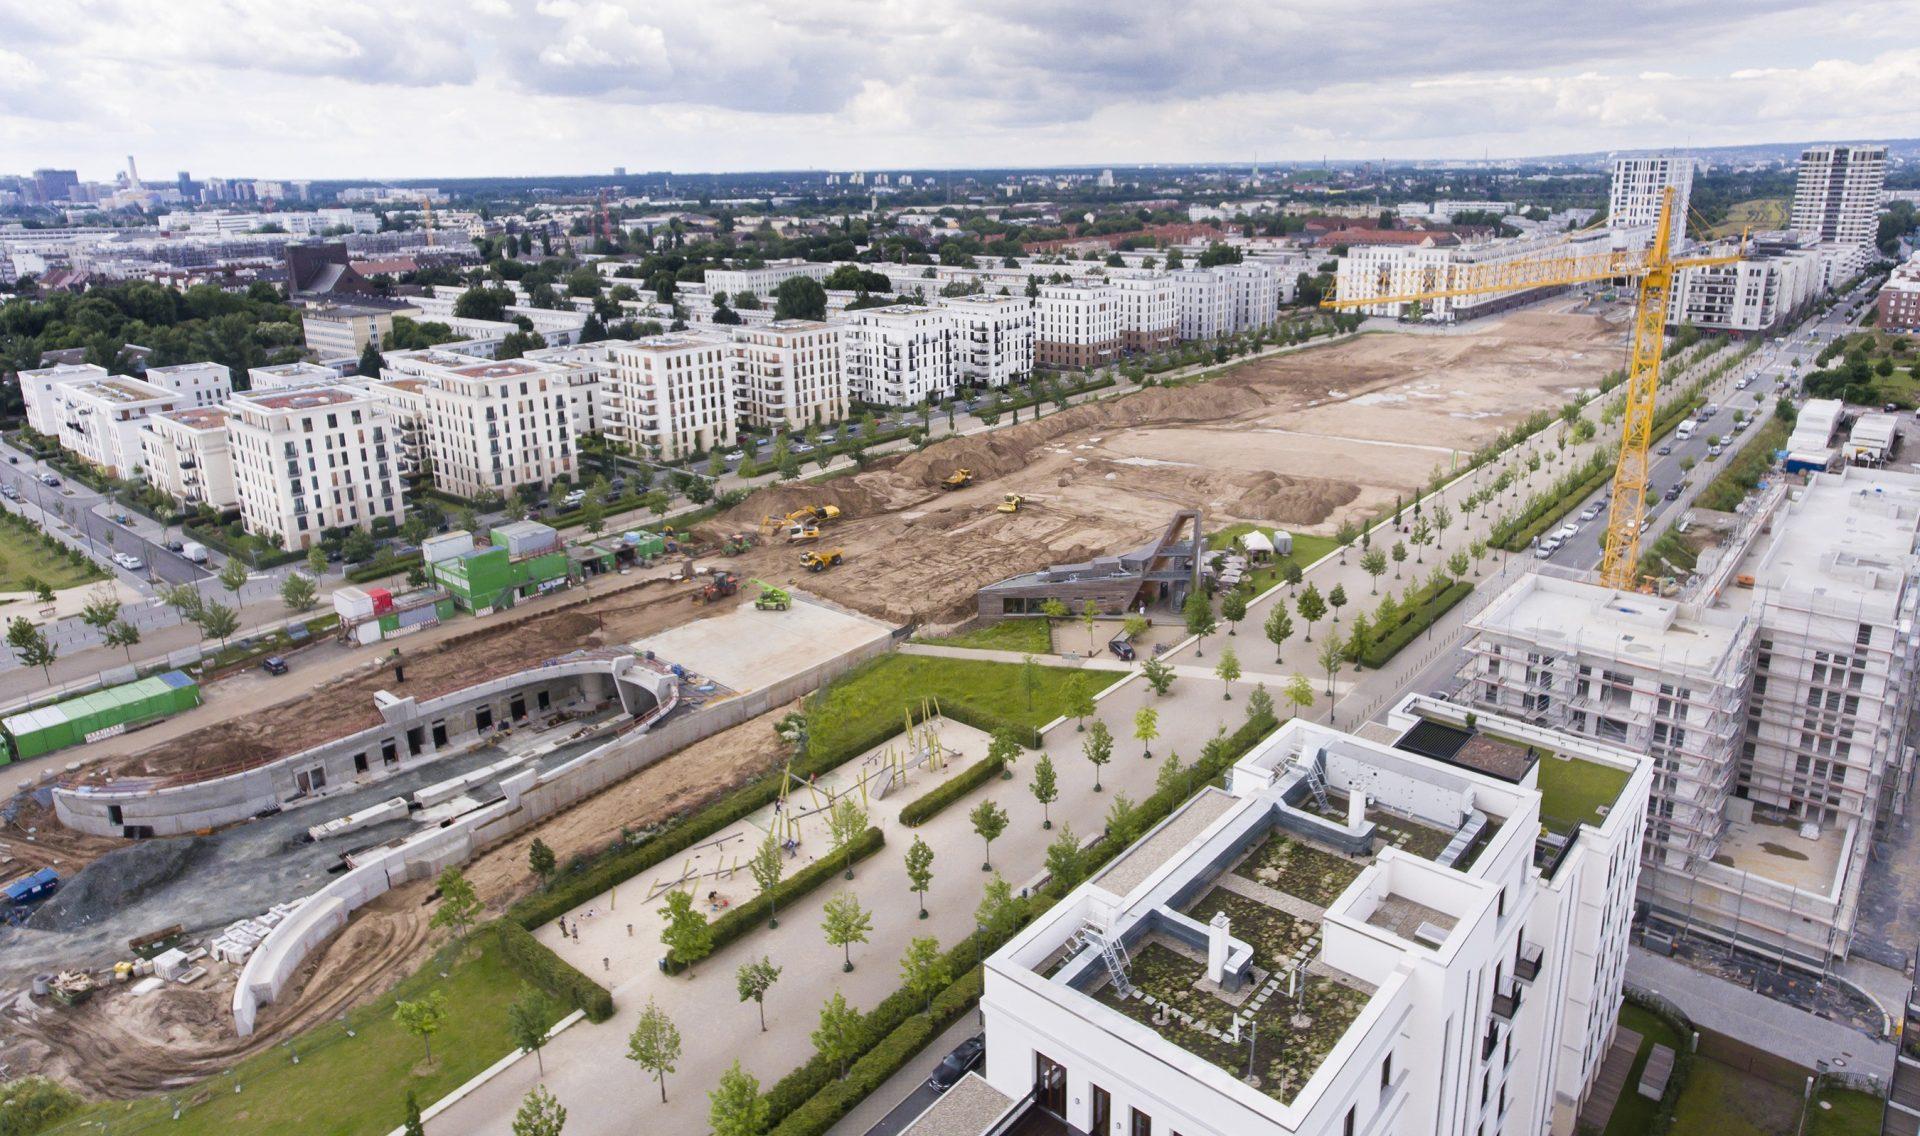 Baustelle Europagarten Frankfurt am Main